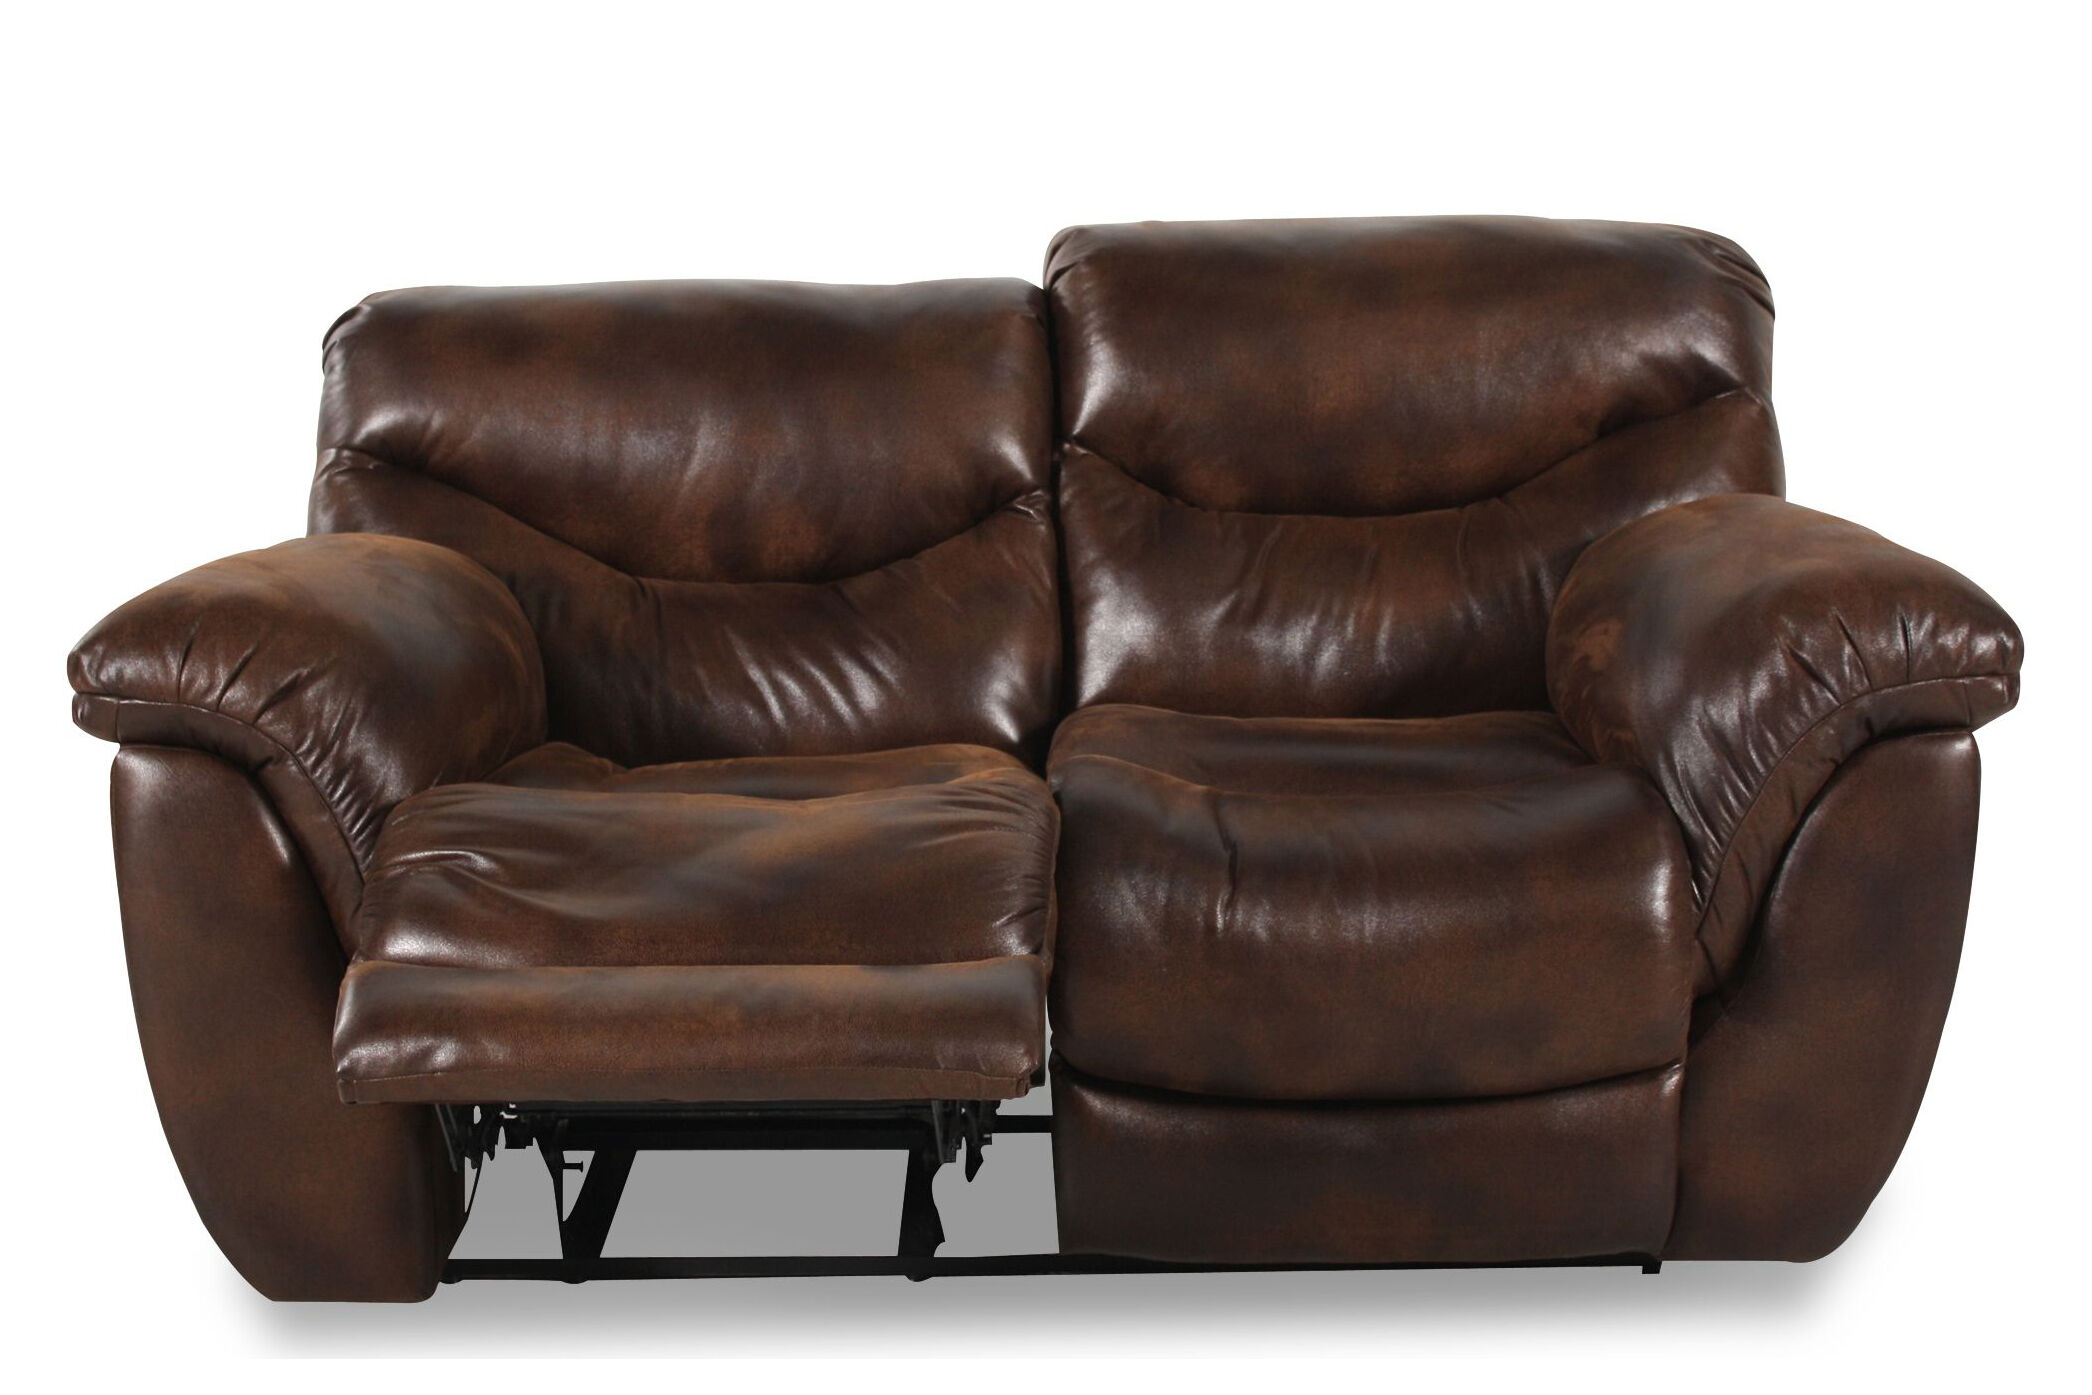 lane triple reclining sofa ercol sofas john lewis dreamer espresso loveseat mathis brothers